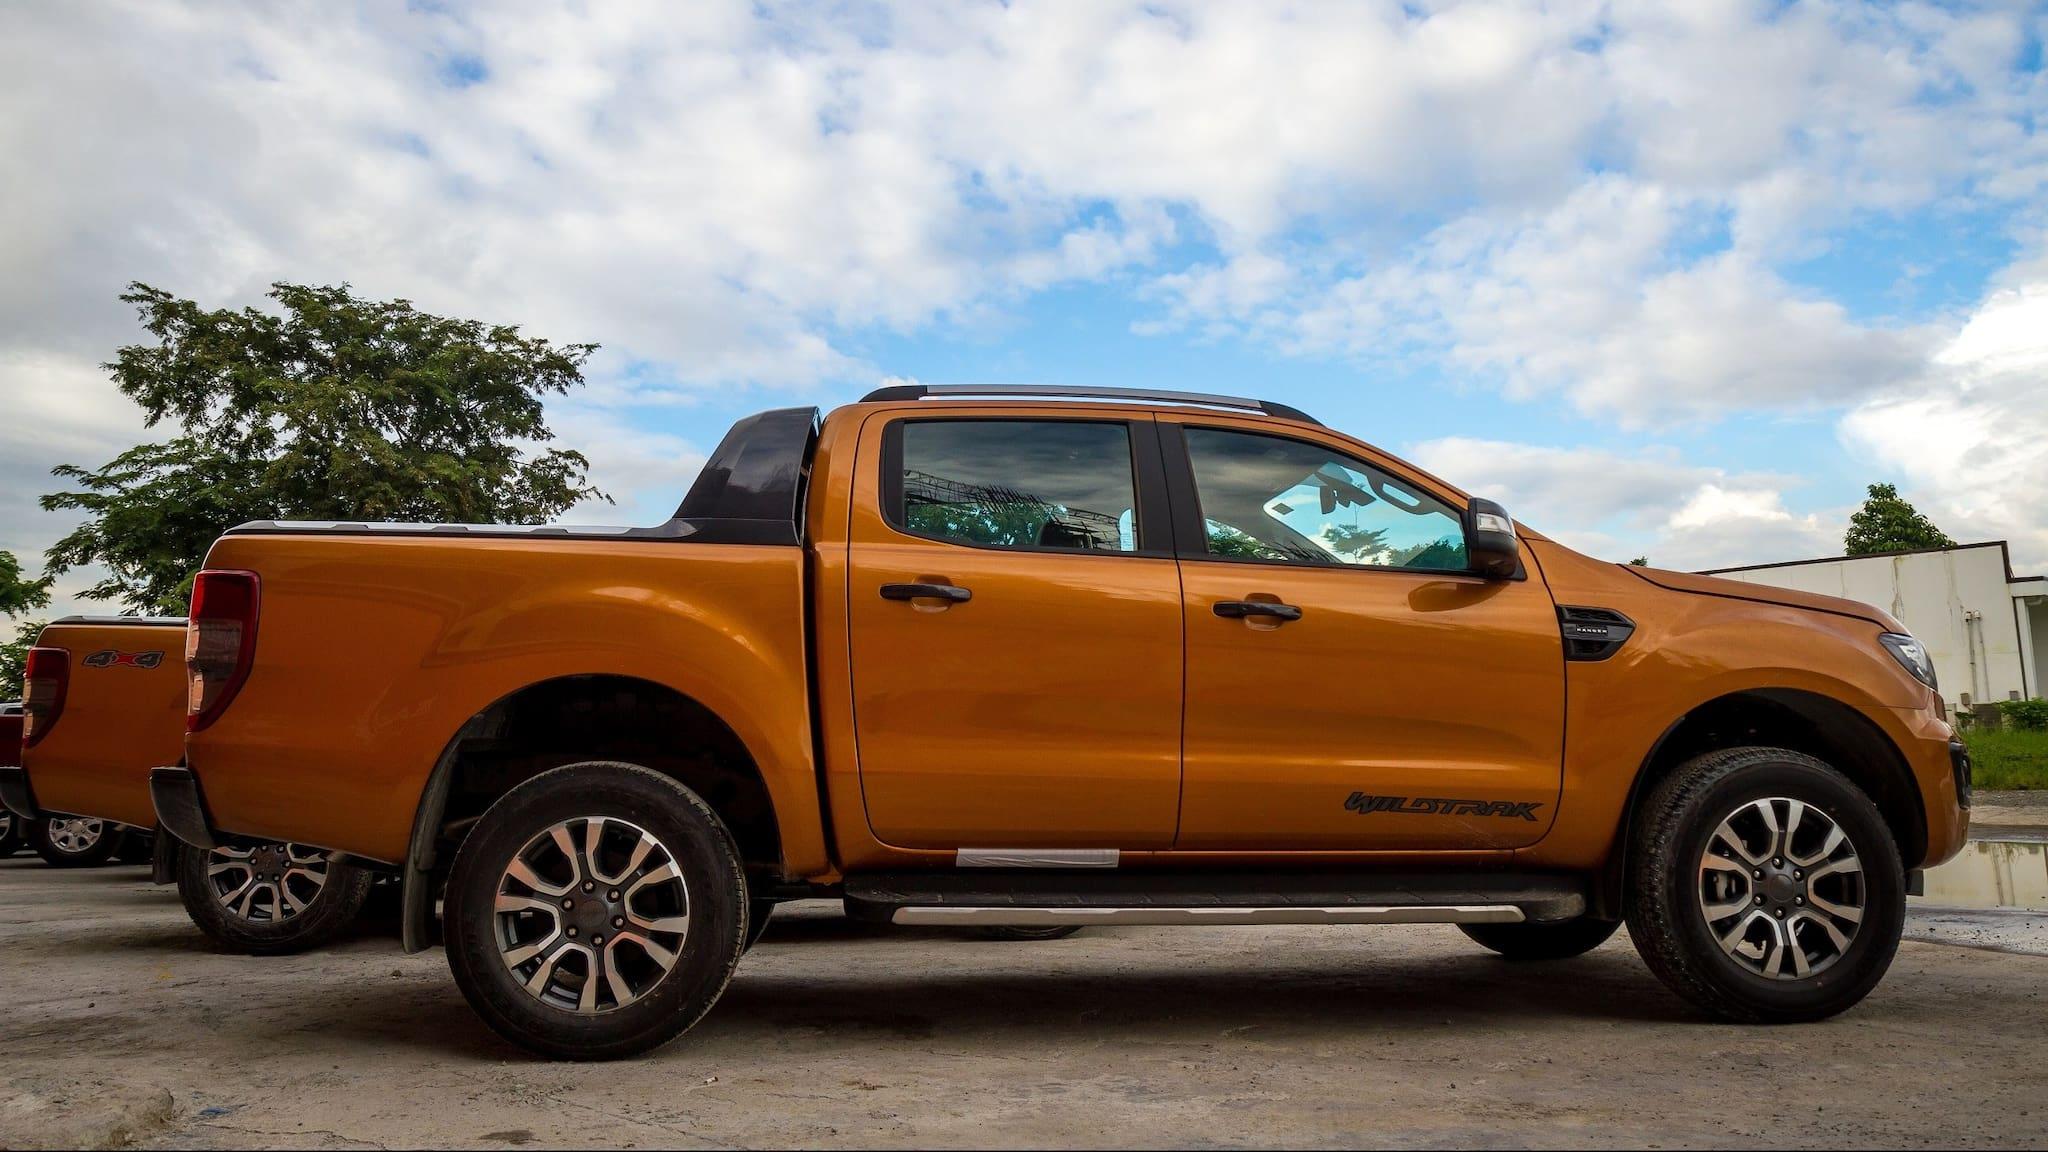 Ford Ranger Leads Ford PH's Sales in September